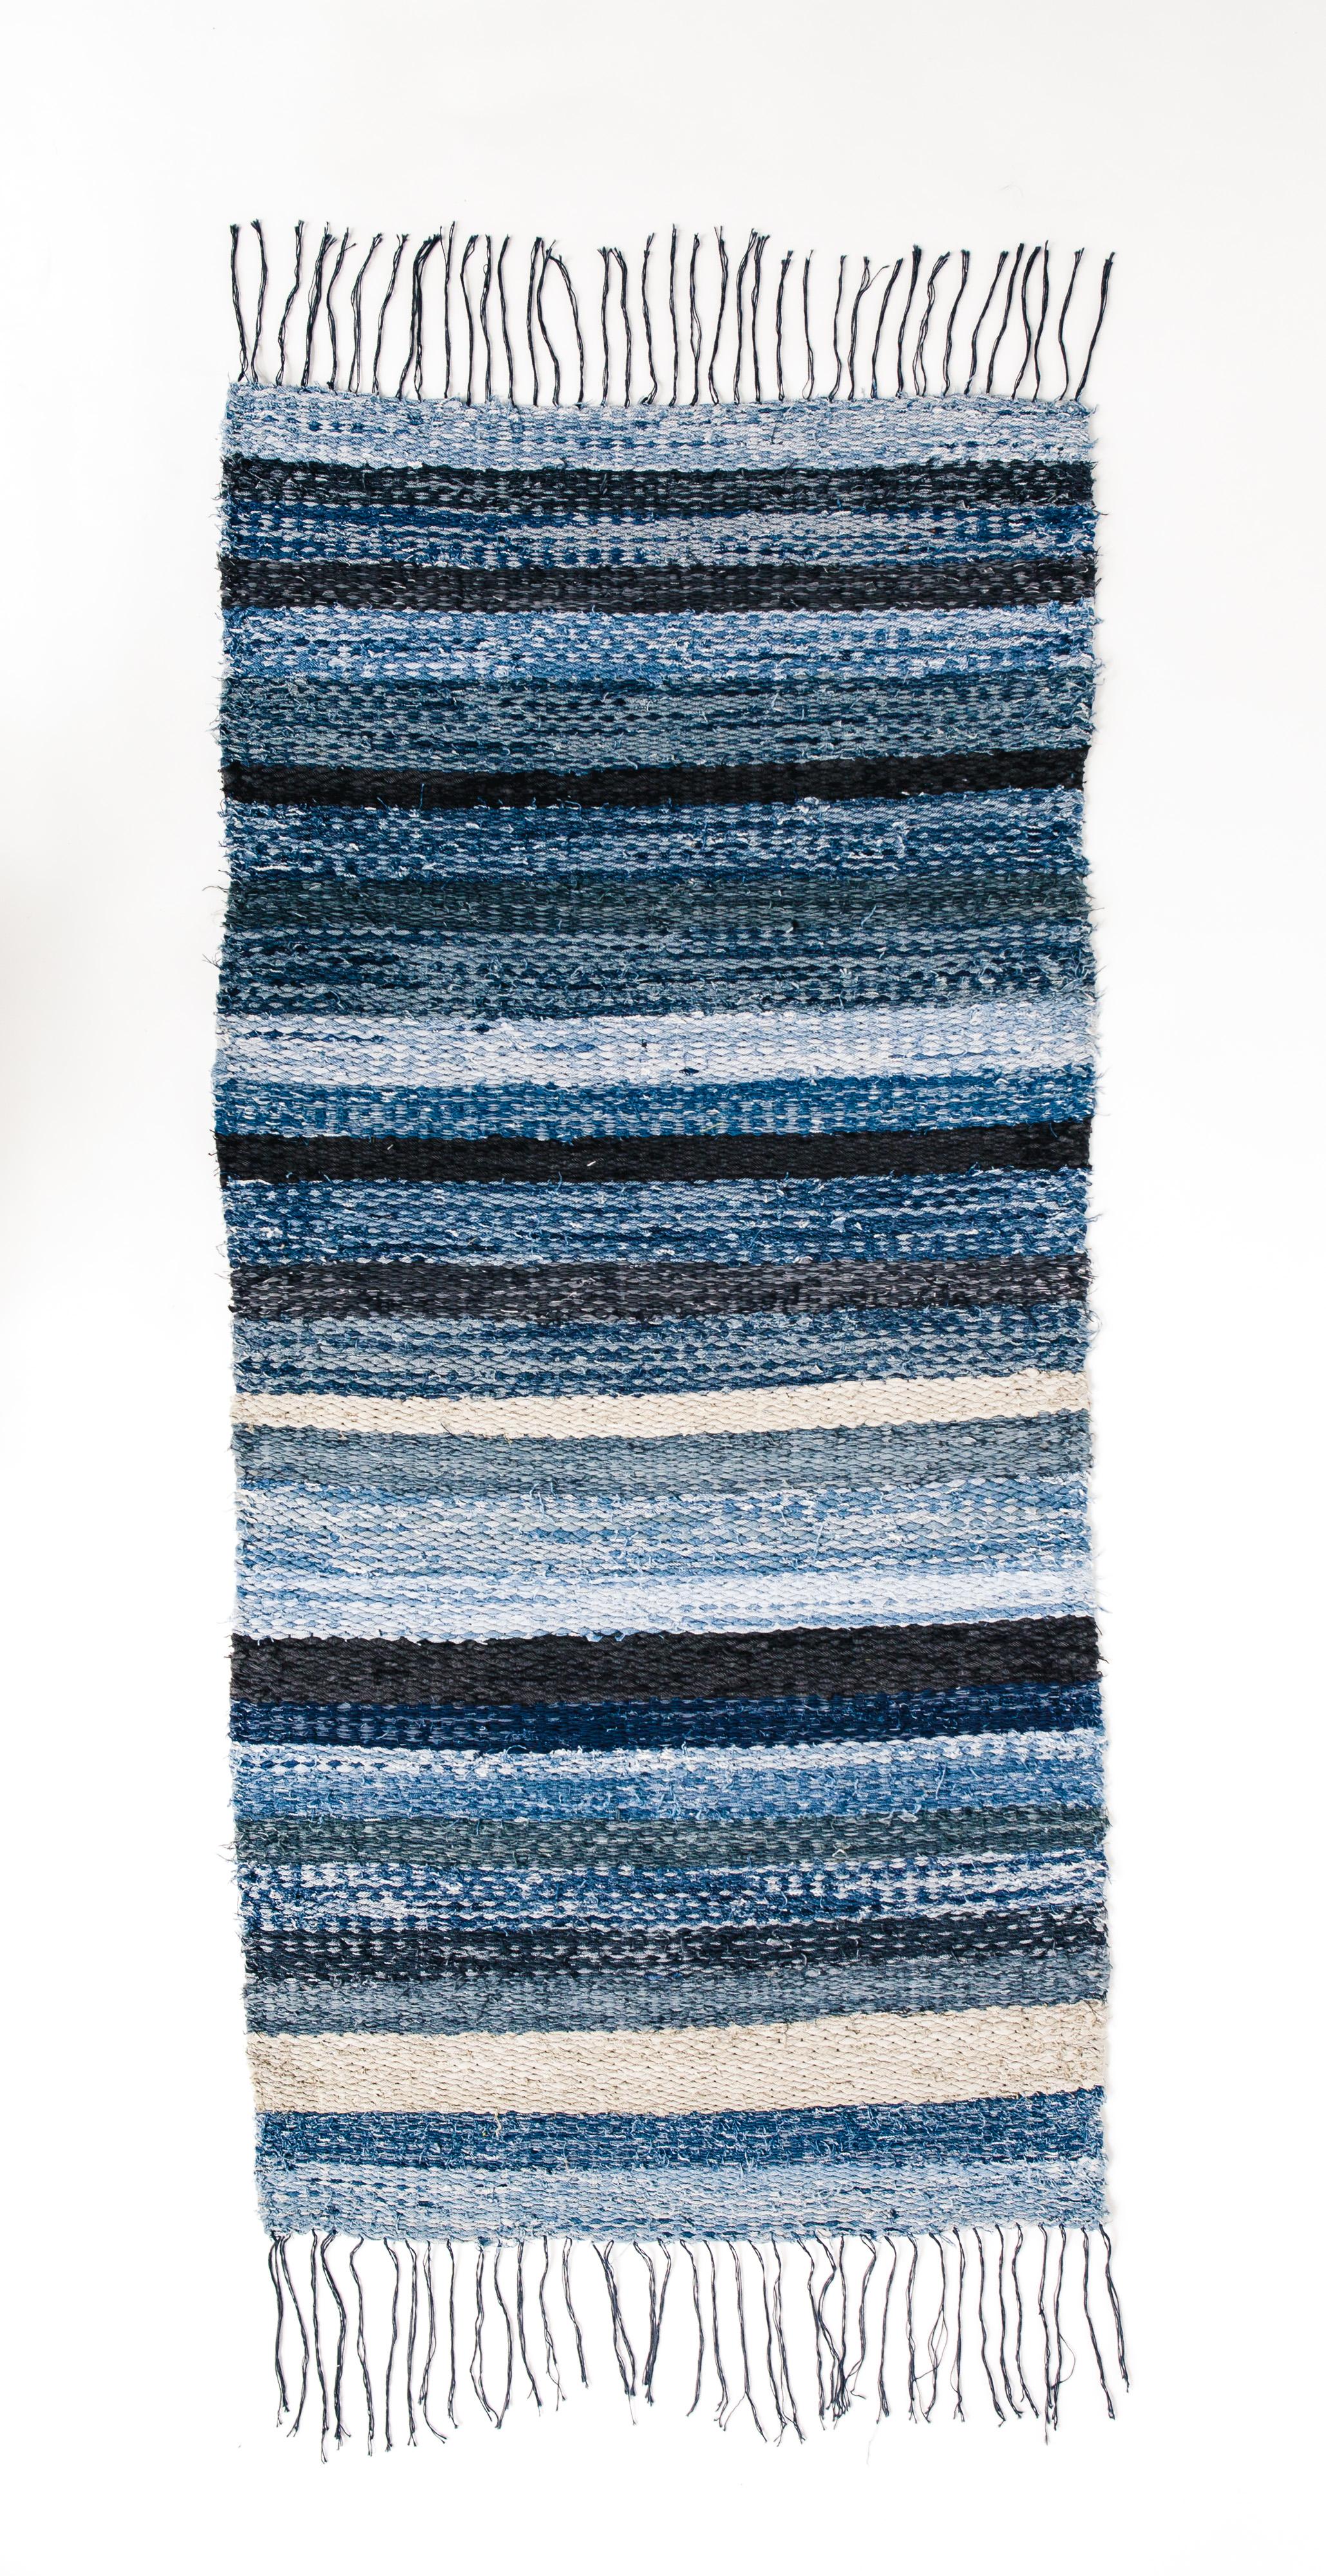 Naked Society mixed denim rug, 3 sizes